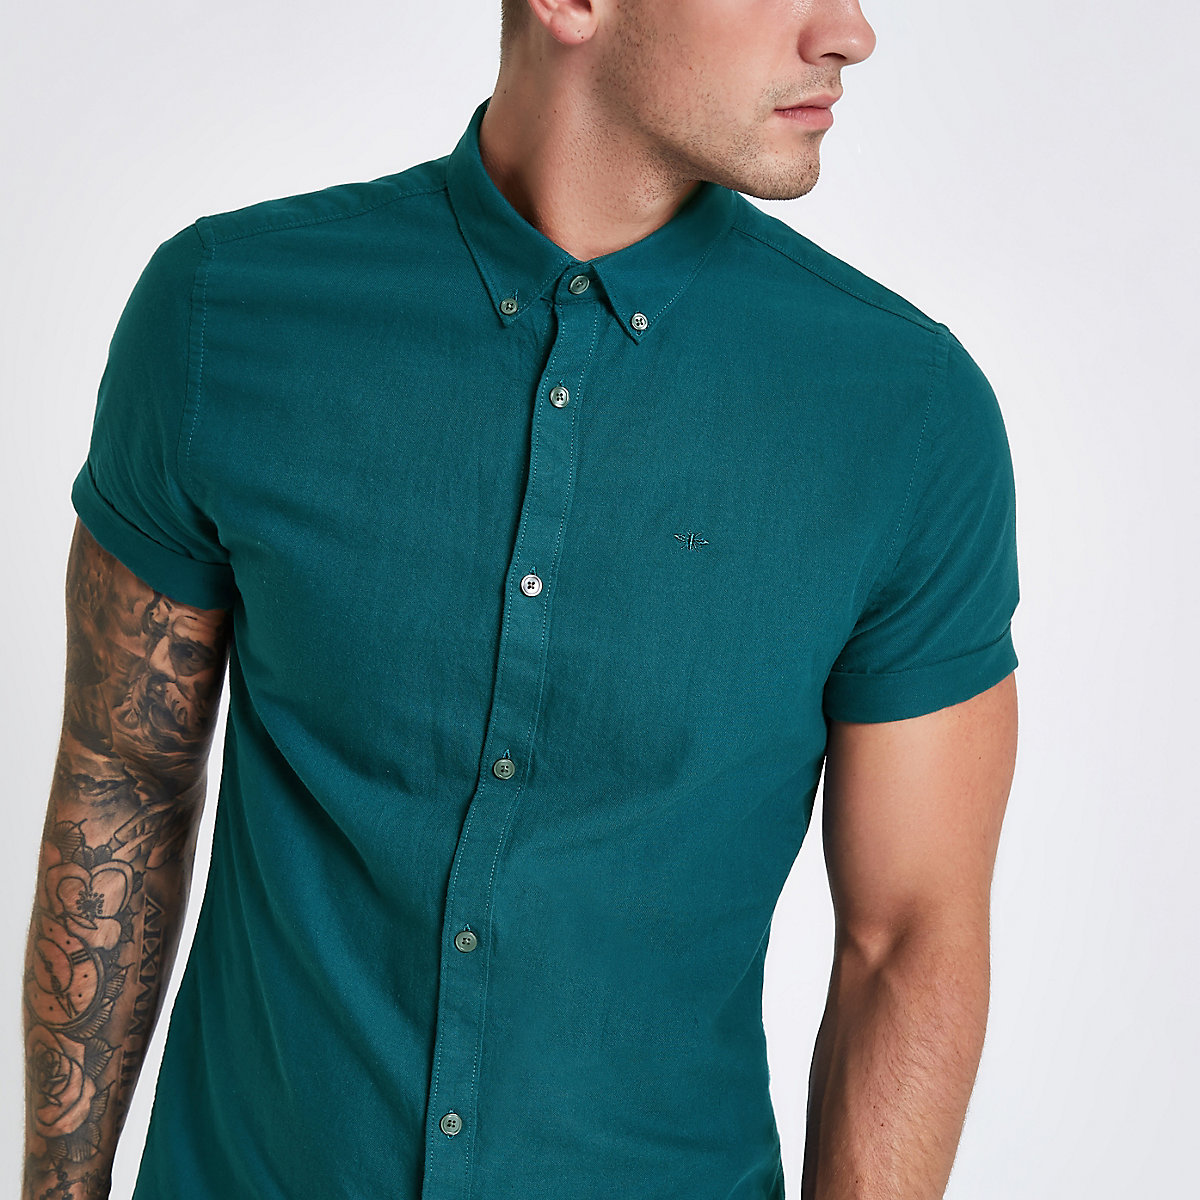 Teal green short sleeve Oxford shirt